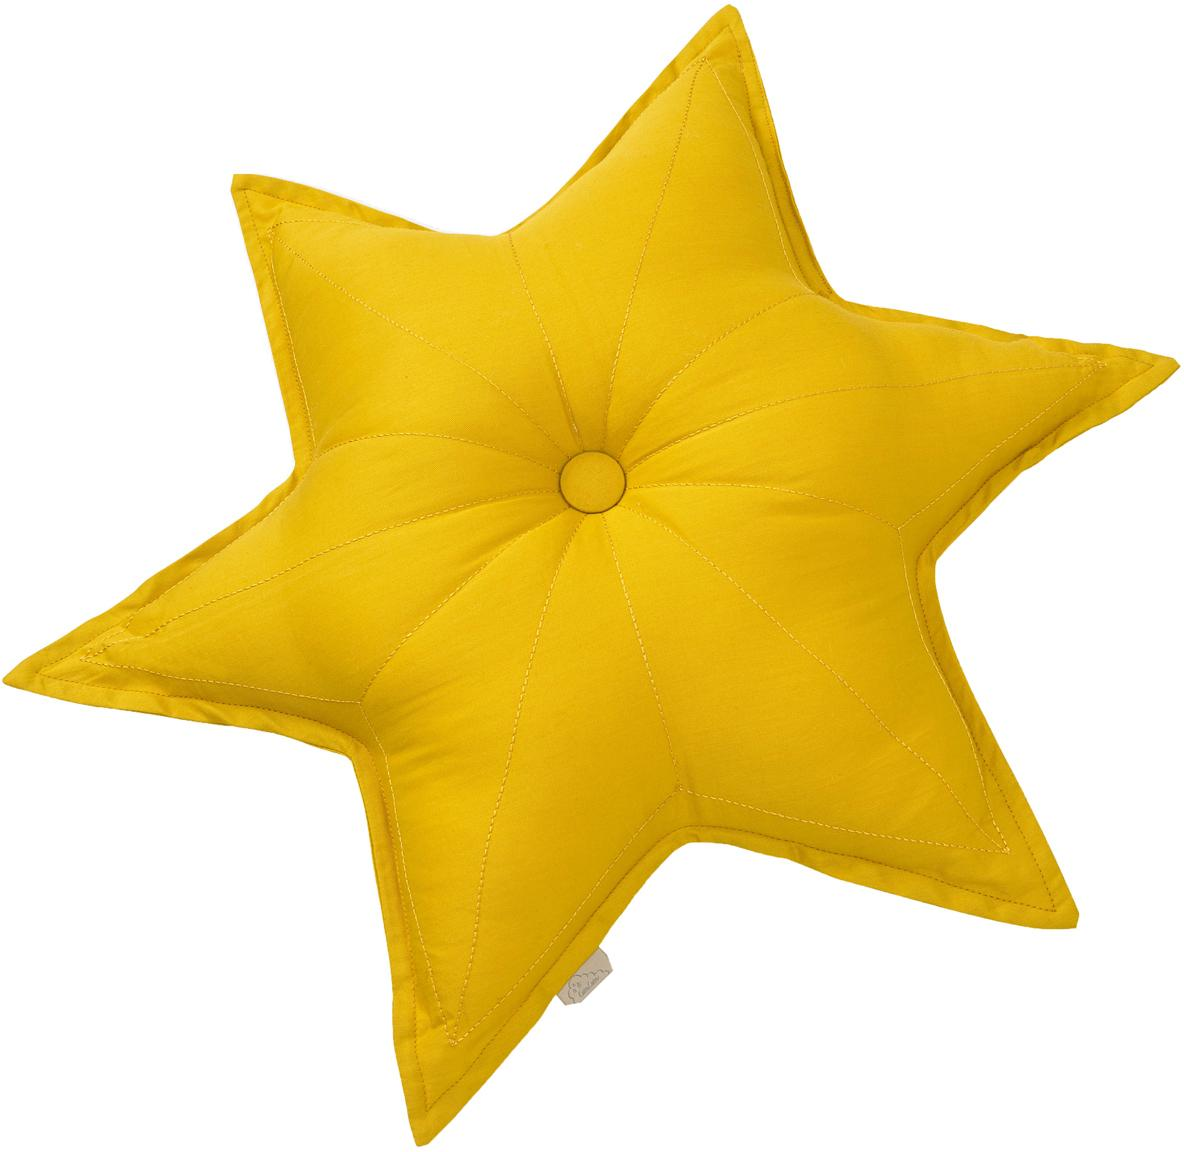 Cojín de algodón ecológico Star, con relleno, Exterior: algodón orgánico, Mostaza, An 45 x L 45 cm